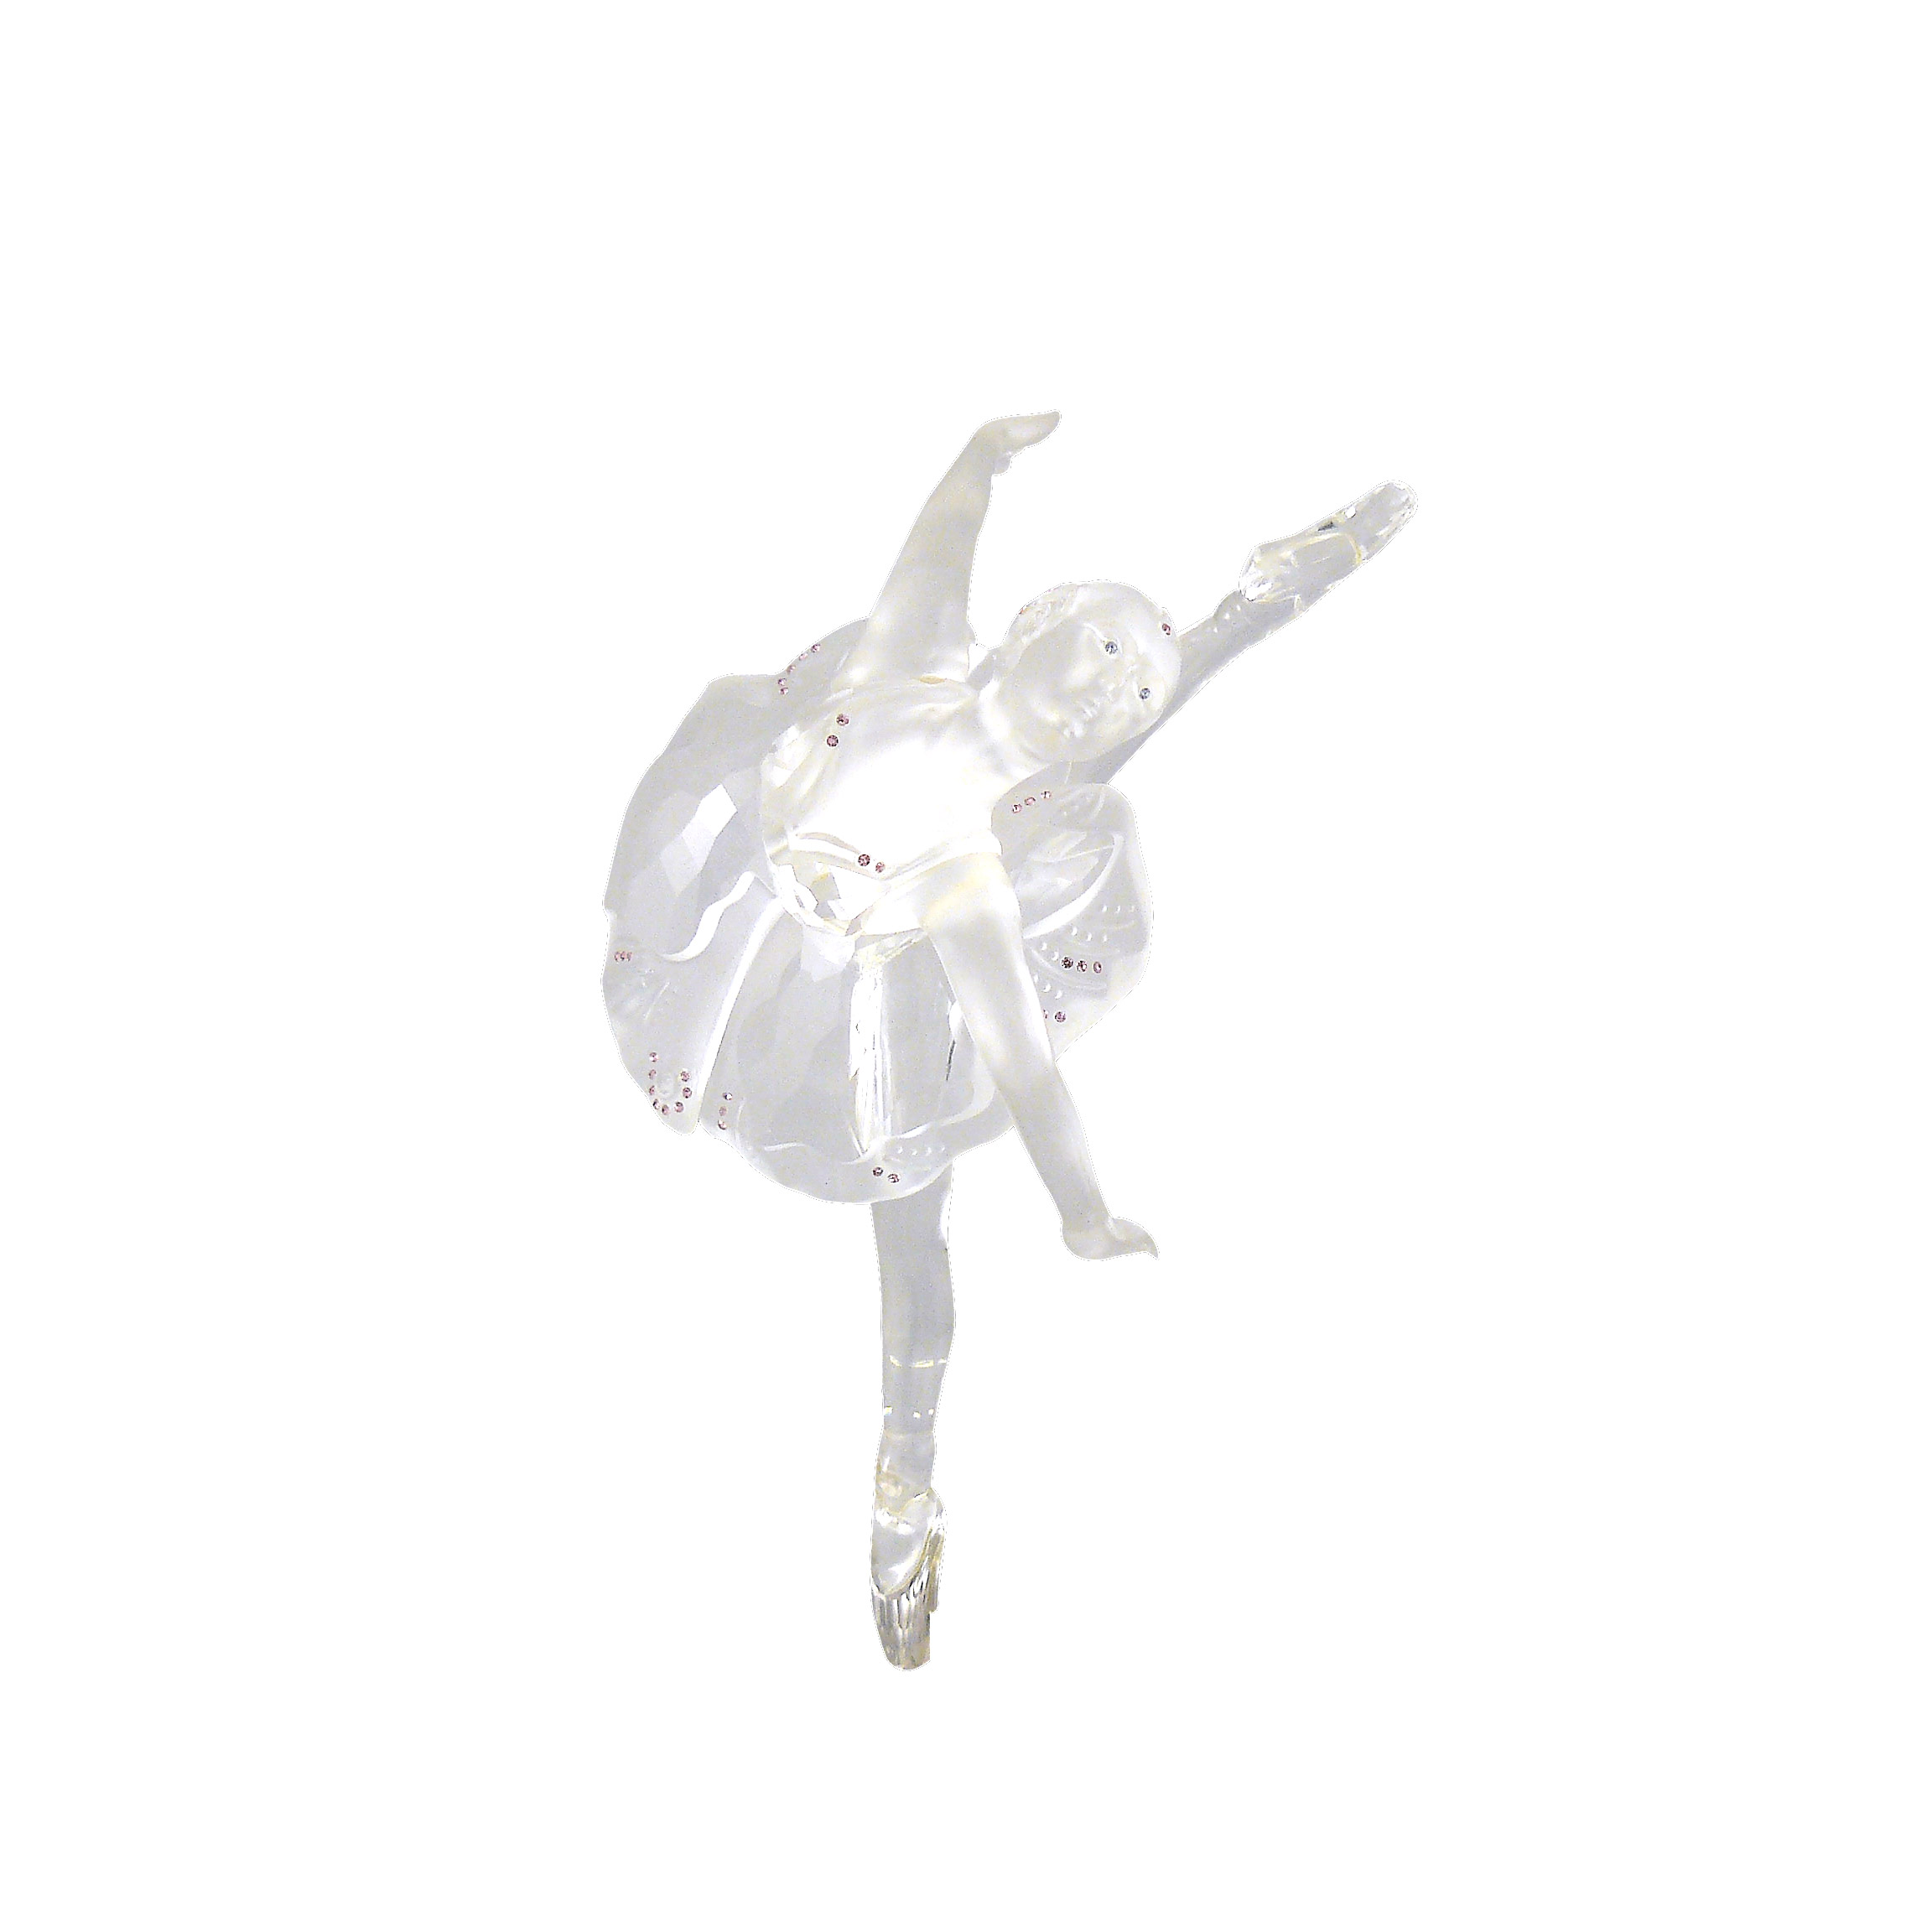 Swarovski Crystal Διακοσμητικό Μπαλαρίνα